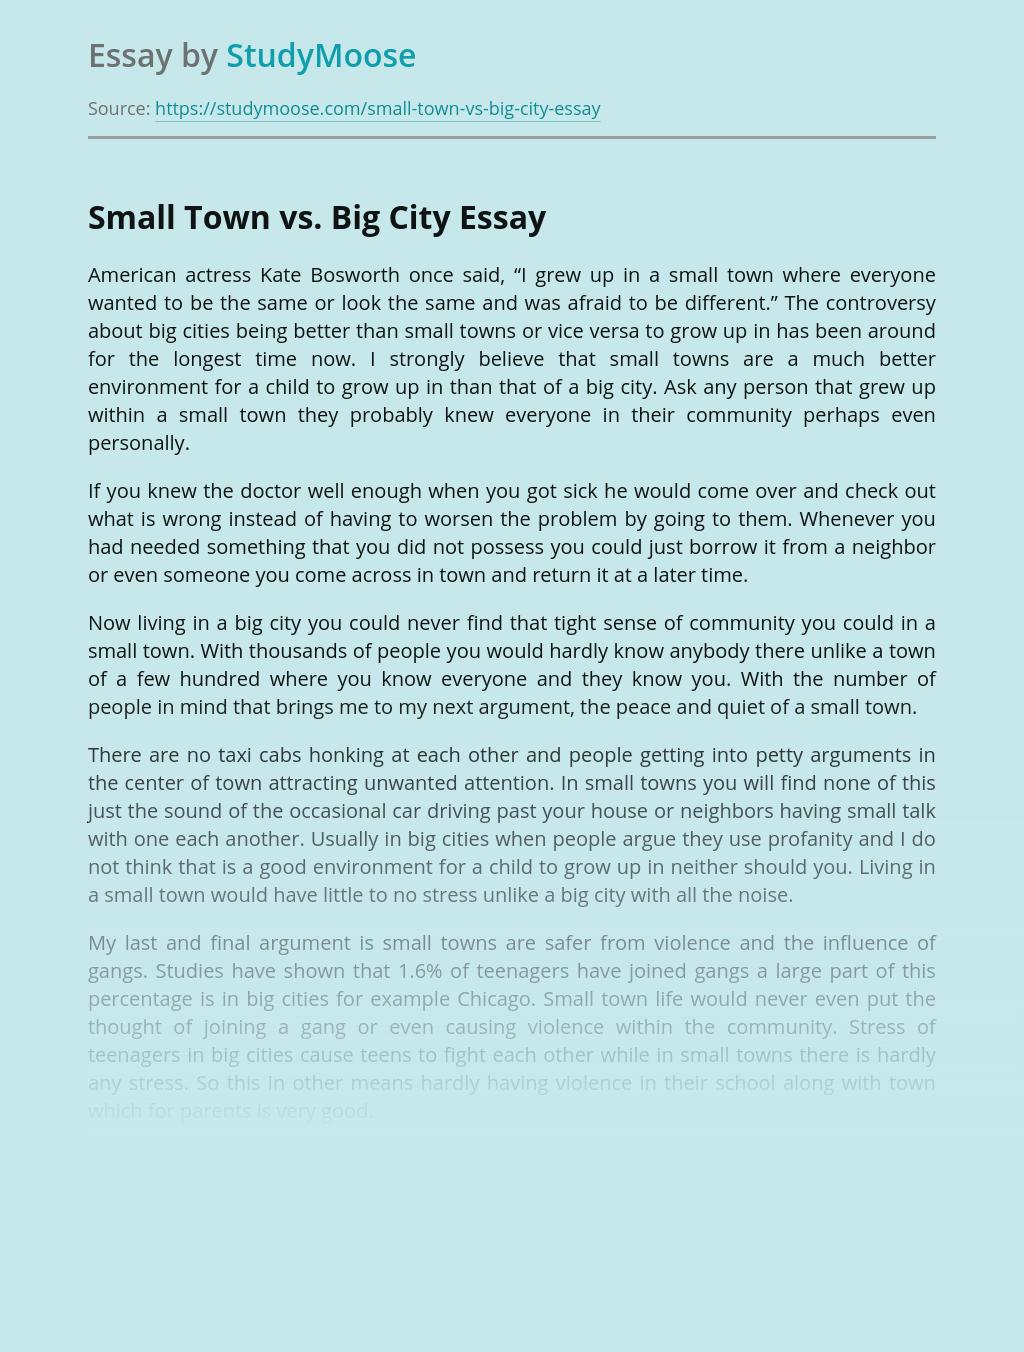 Small Town vs. Big City